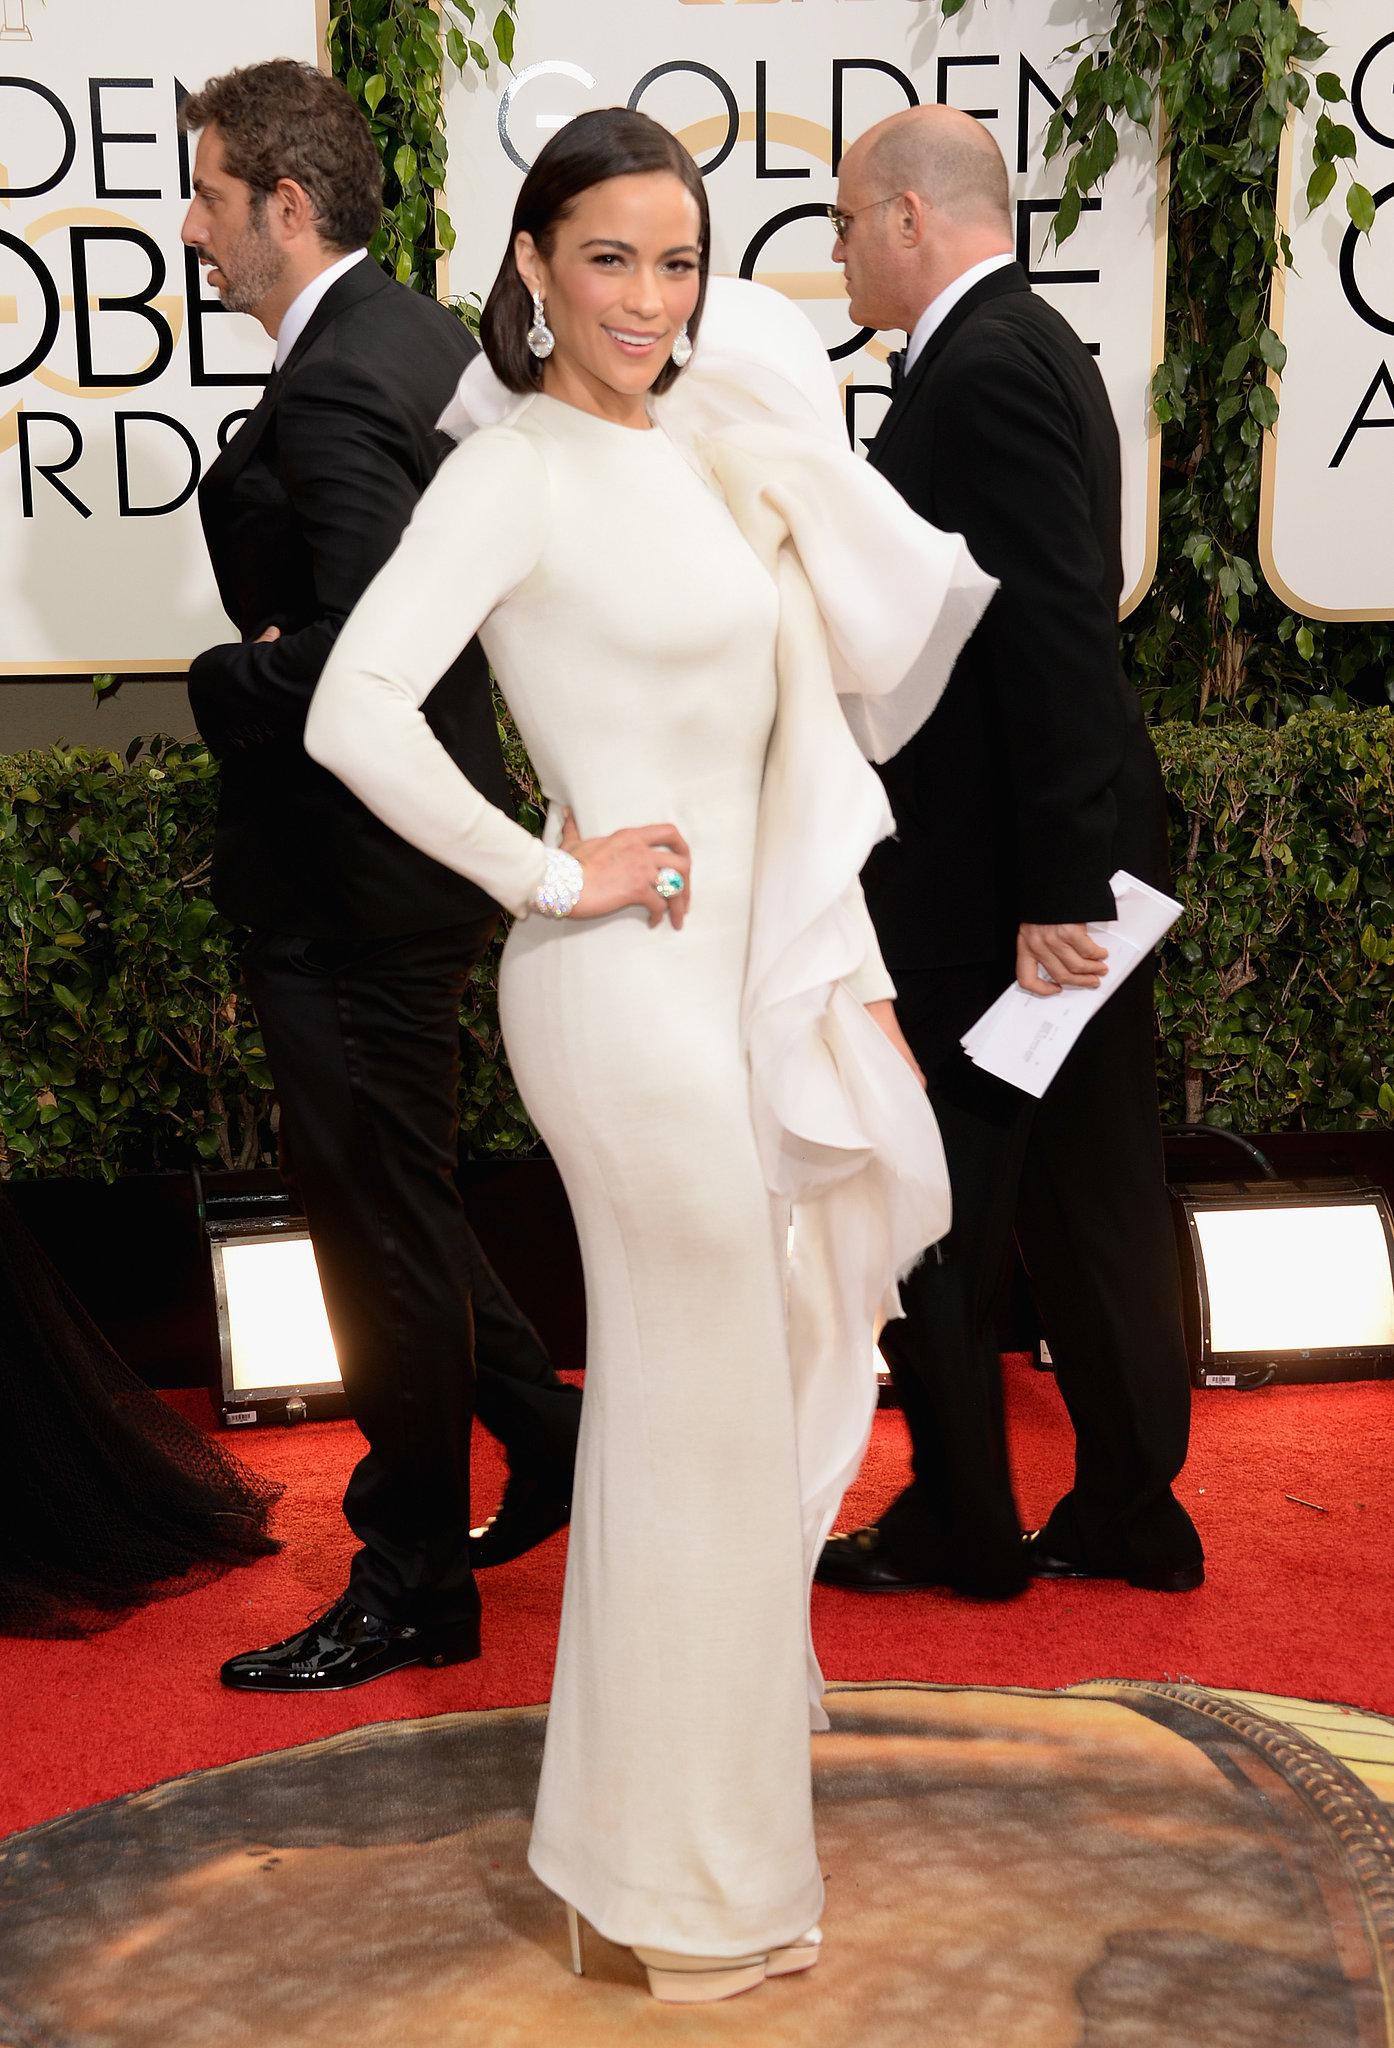 Paula Patton wore a dramatic white gown.